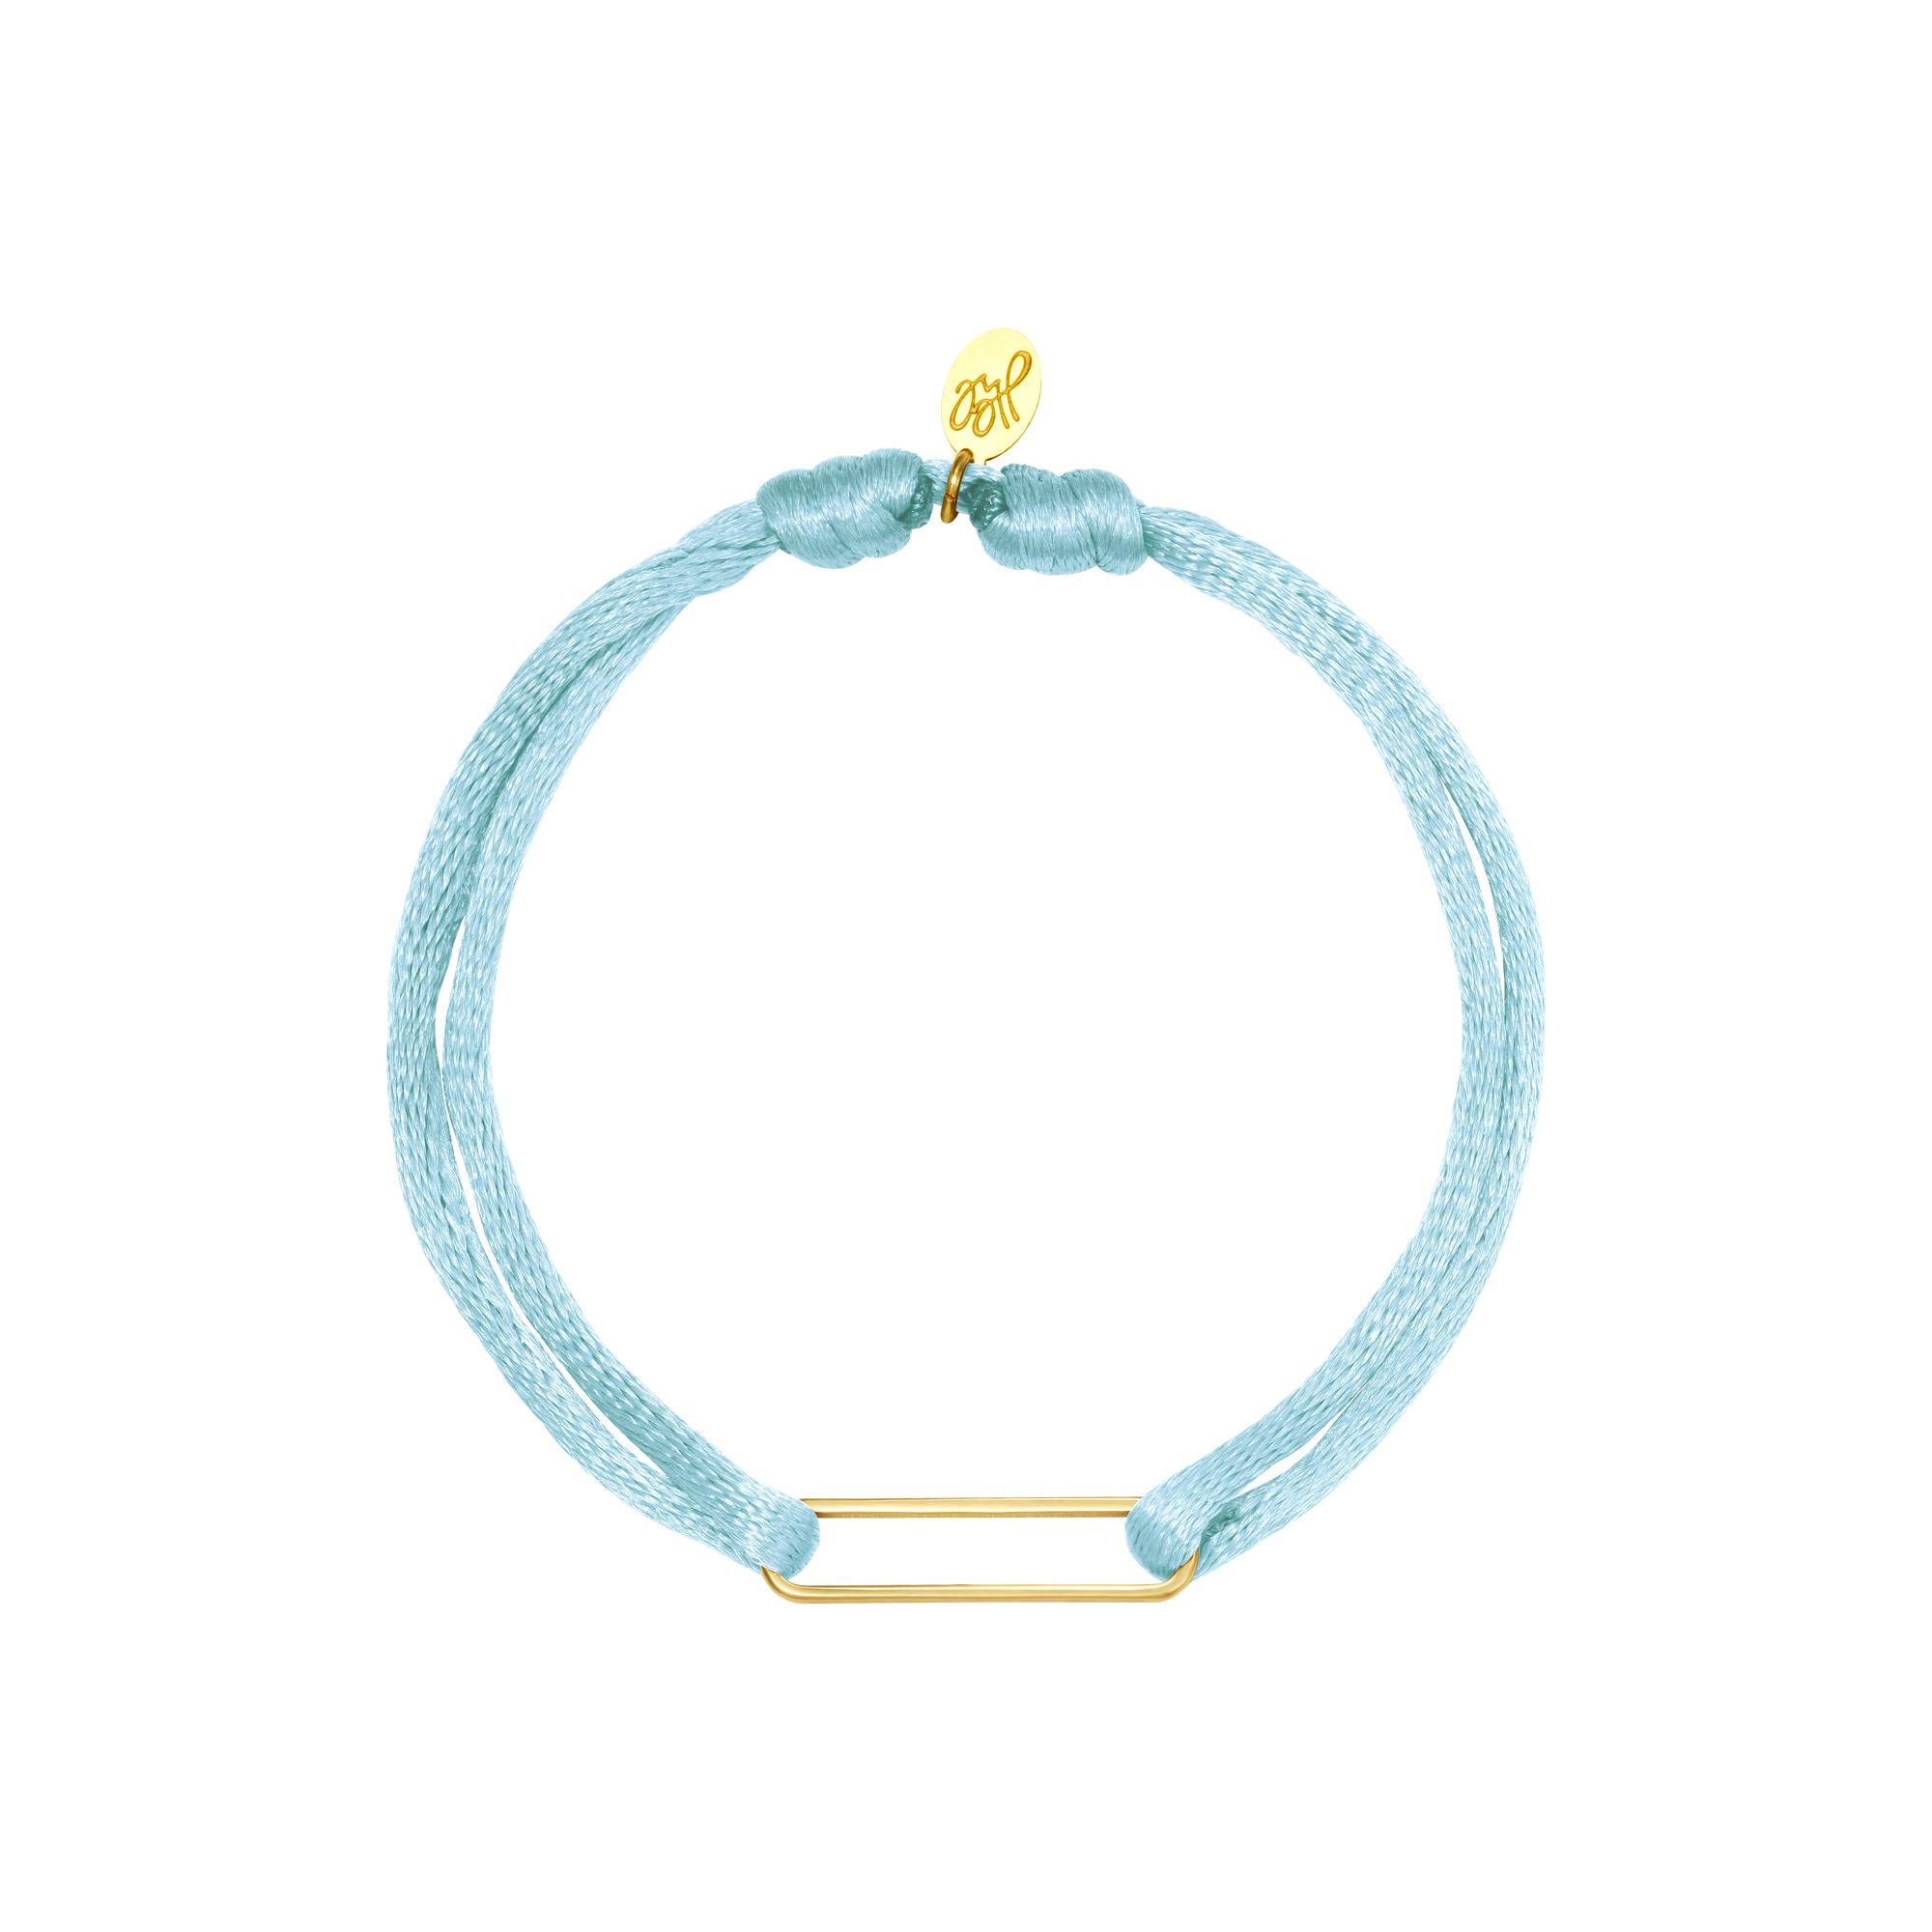 Armband satin clip